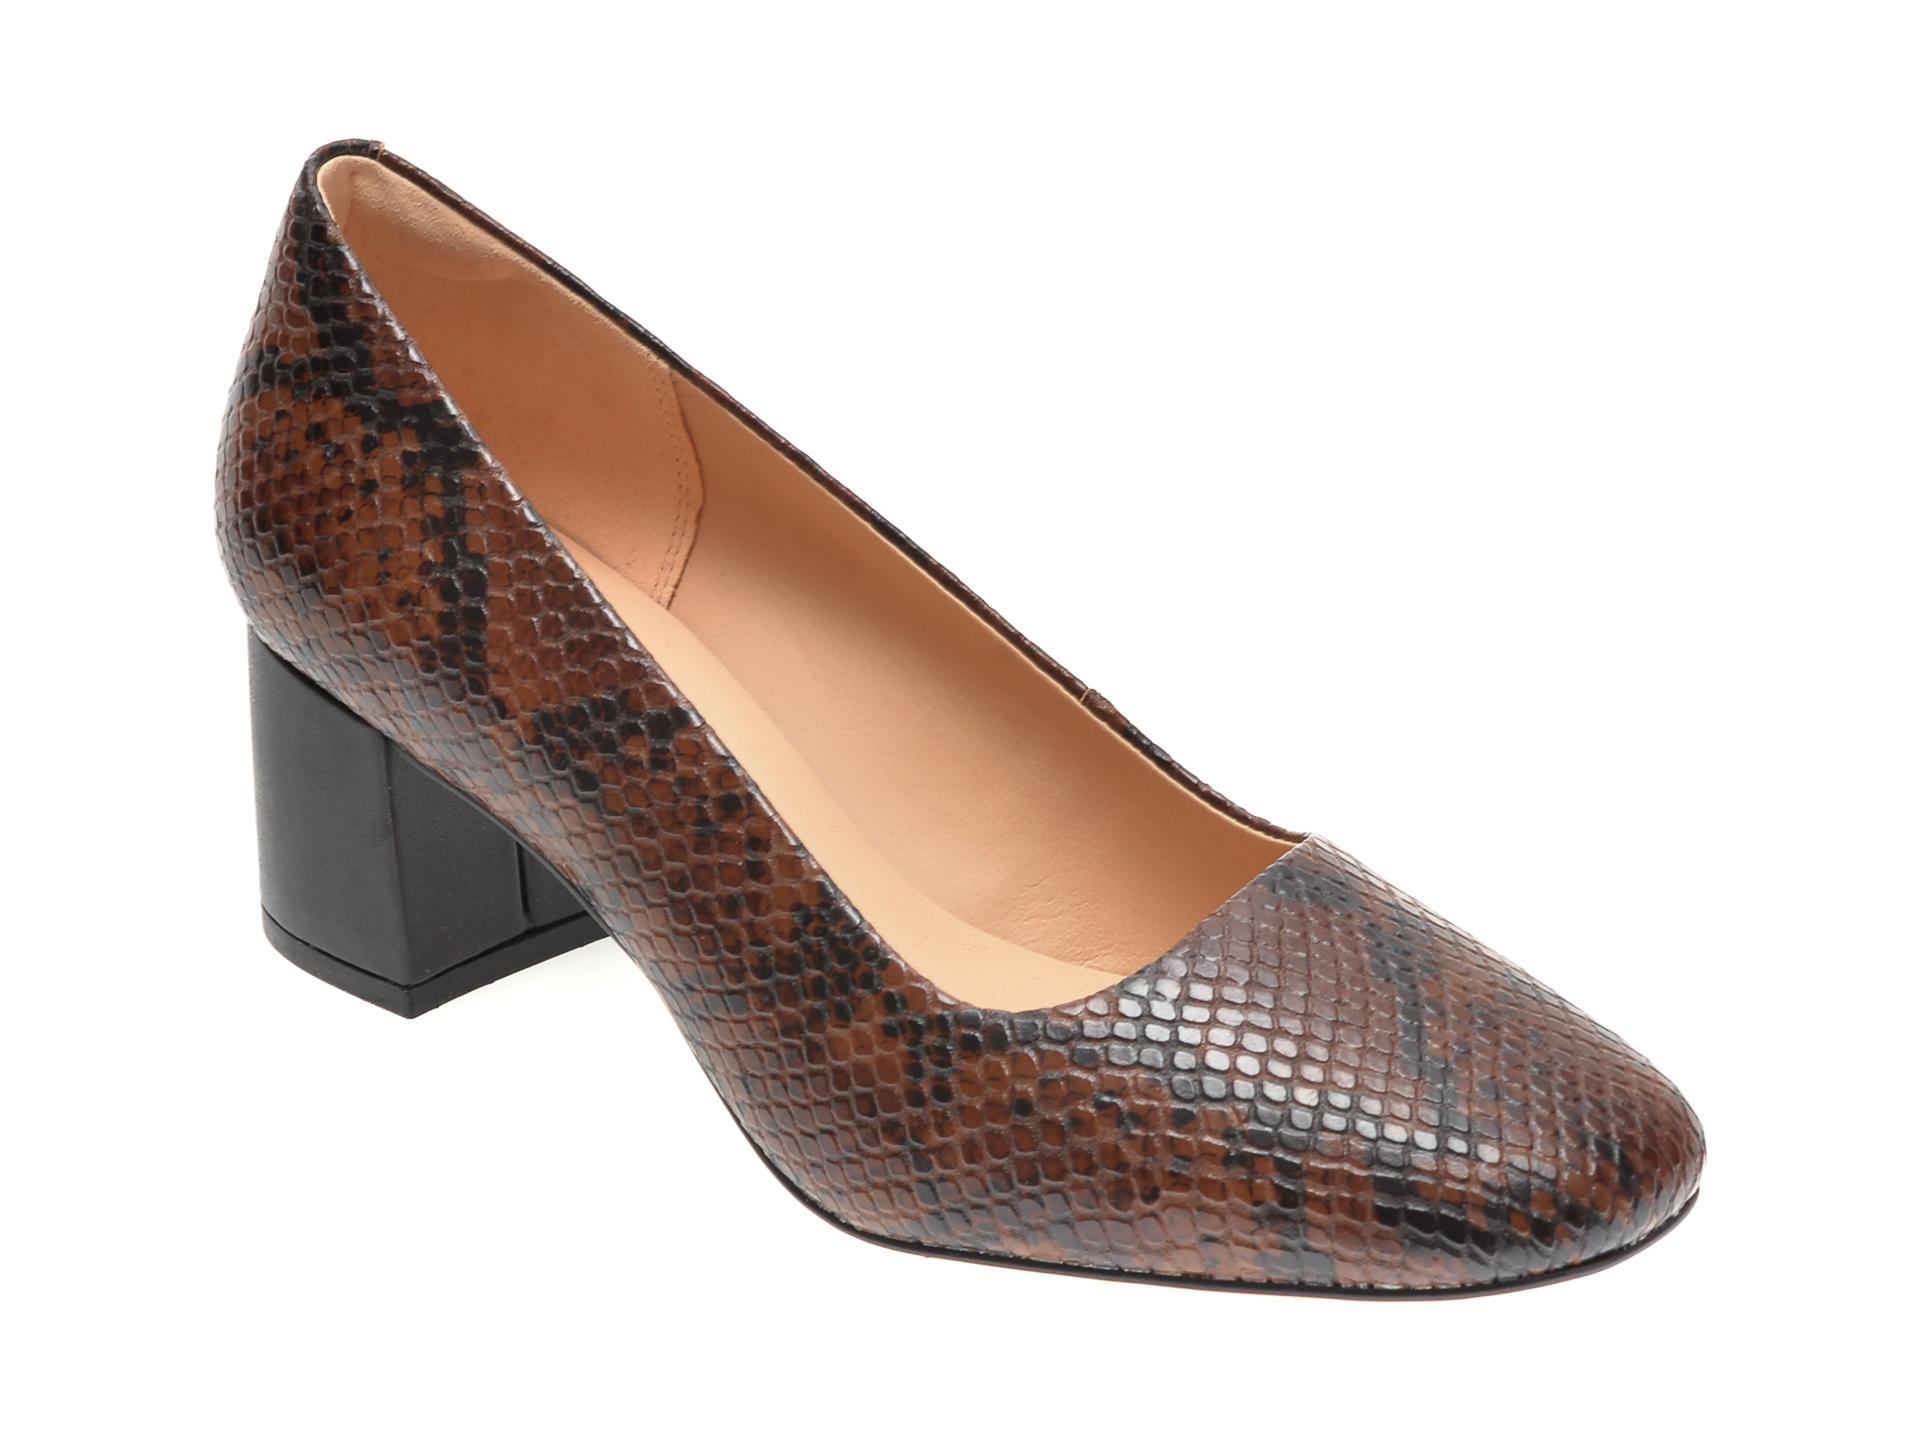 Pantofi CLARKS maro, SHEER ROSE 2, din piele naturala imagine